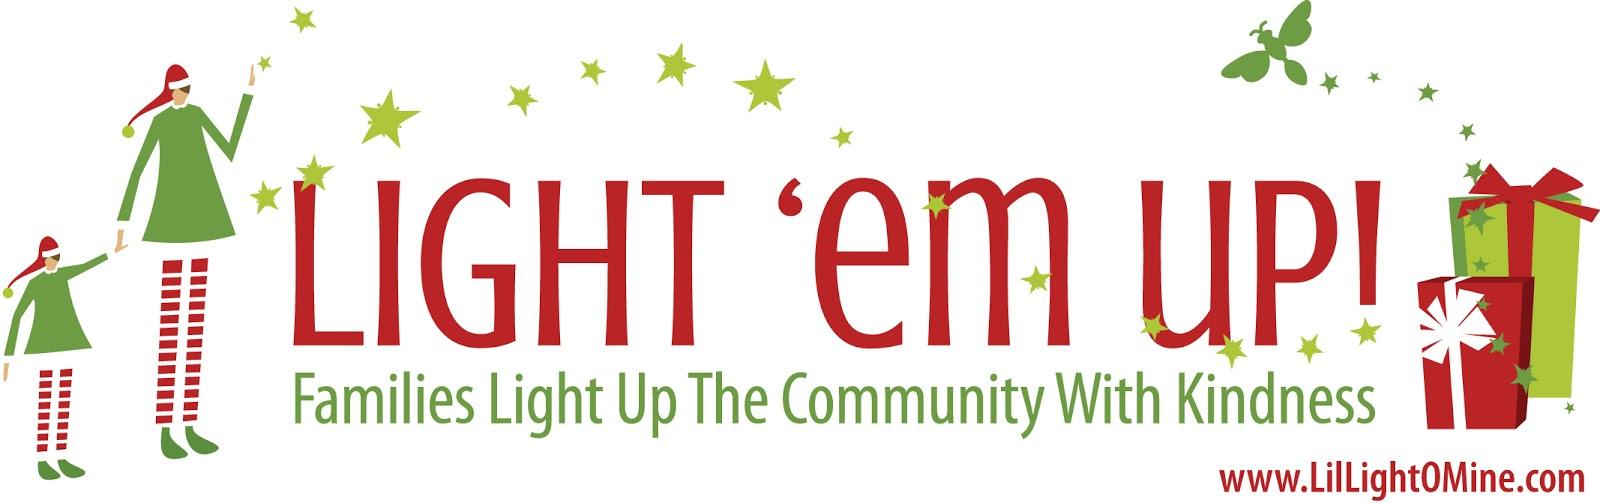 Light em up ideas amp freebies a list of 100 random acts of kindness